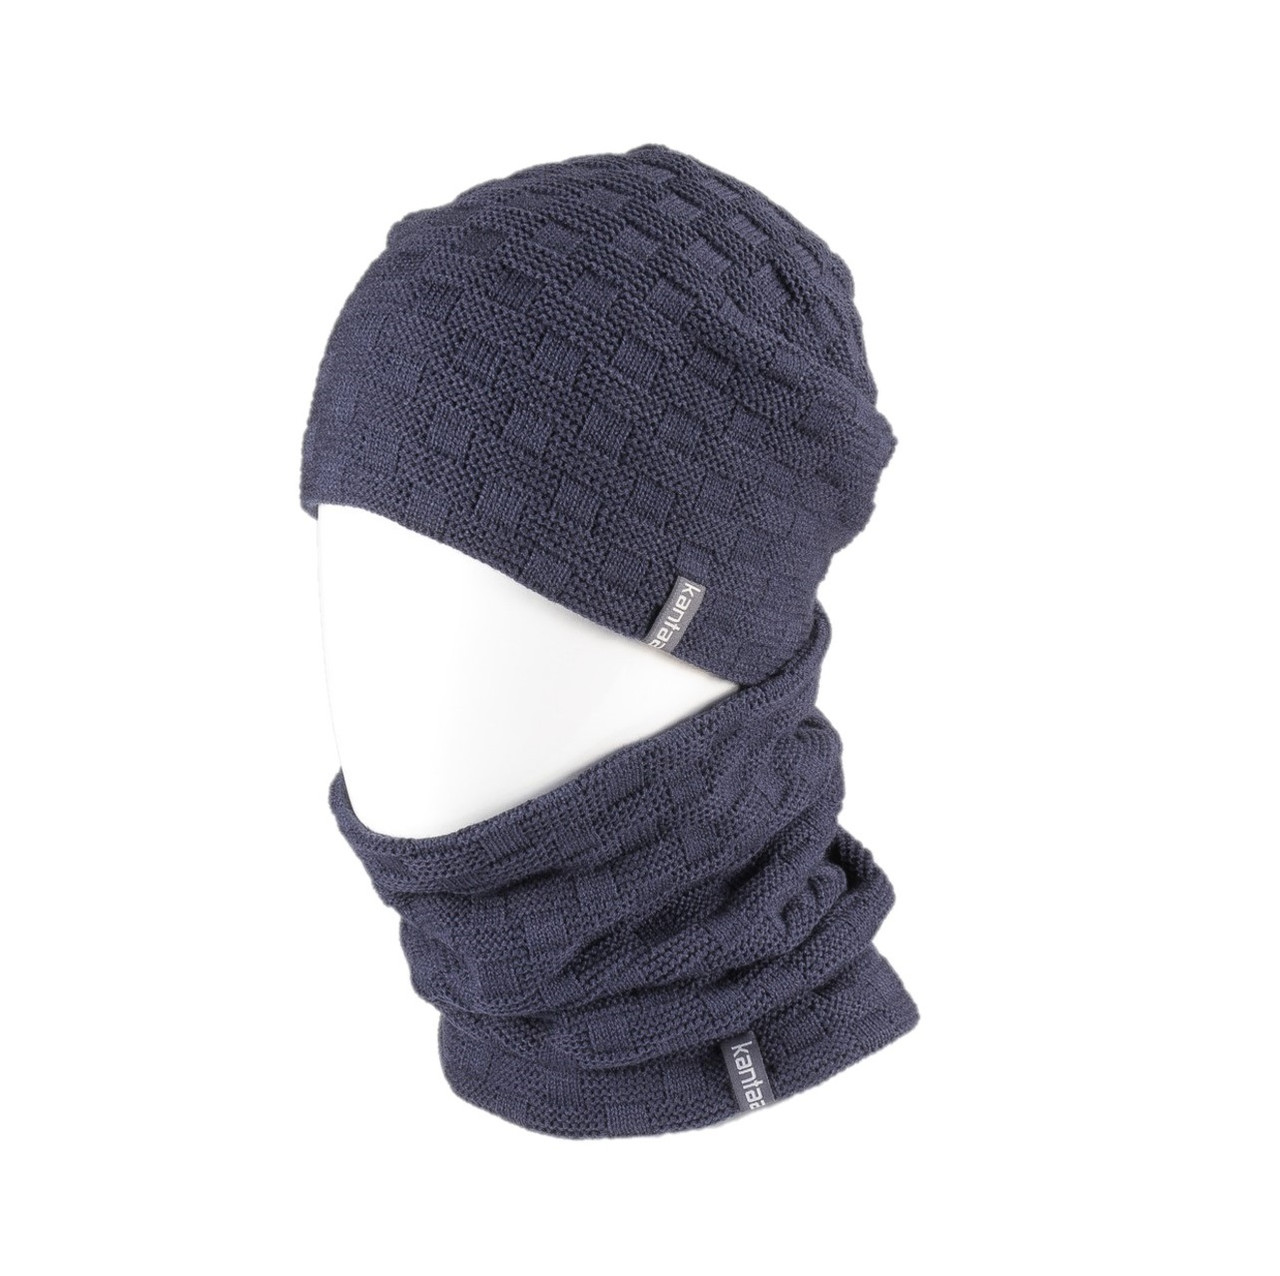 Вязаная шапка с Buff снуд КАНТА унисекс размер взрослый, синий (OC-046)